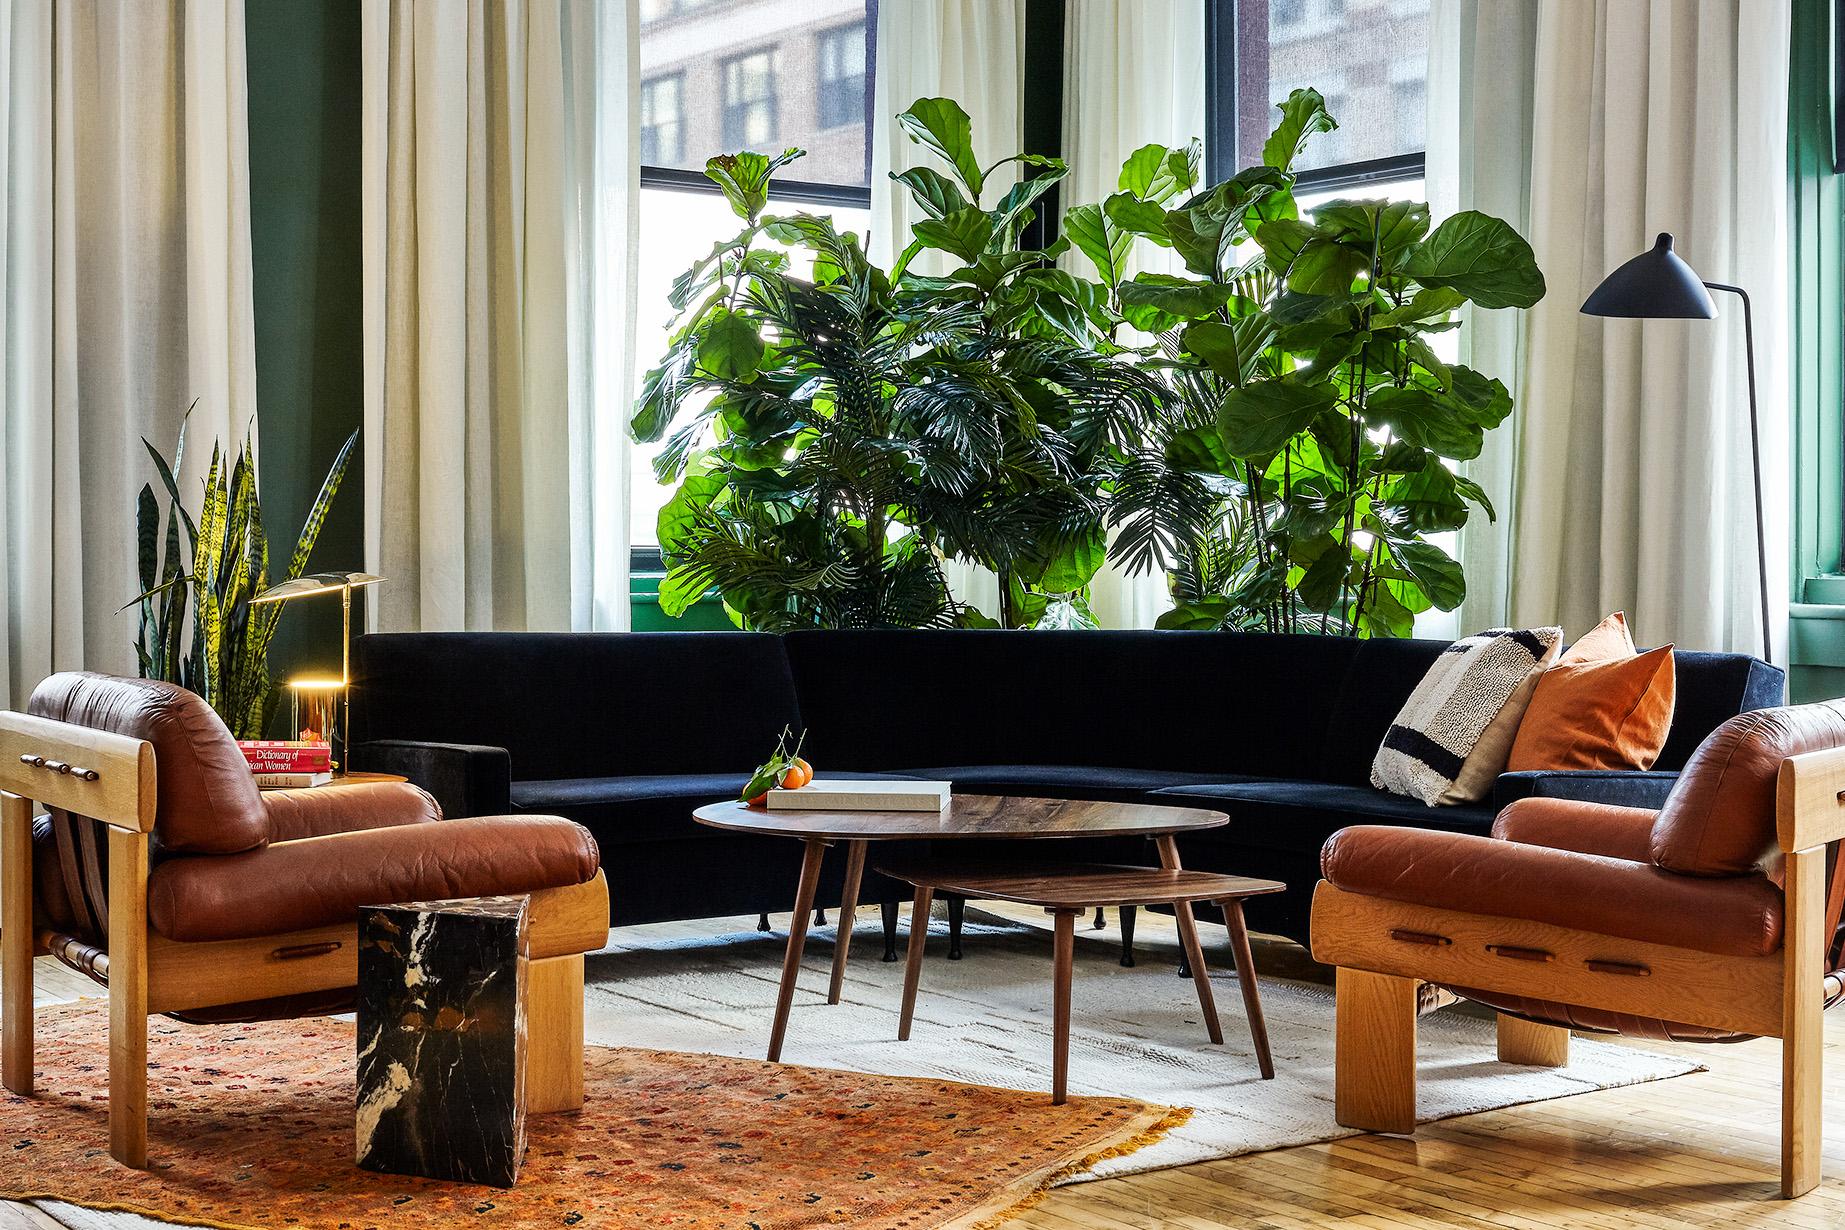 piante sedie tappeti